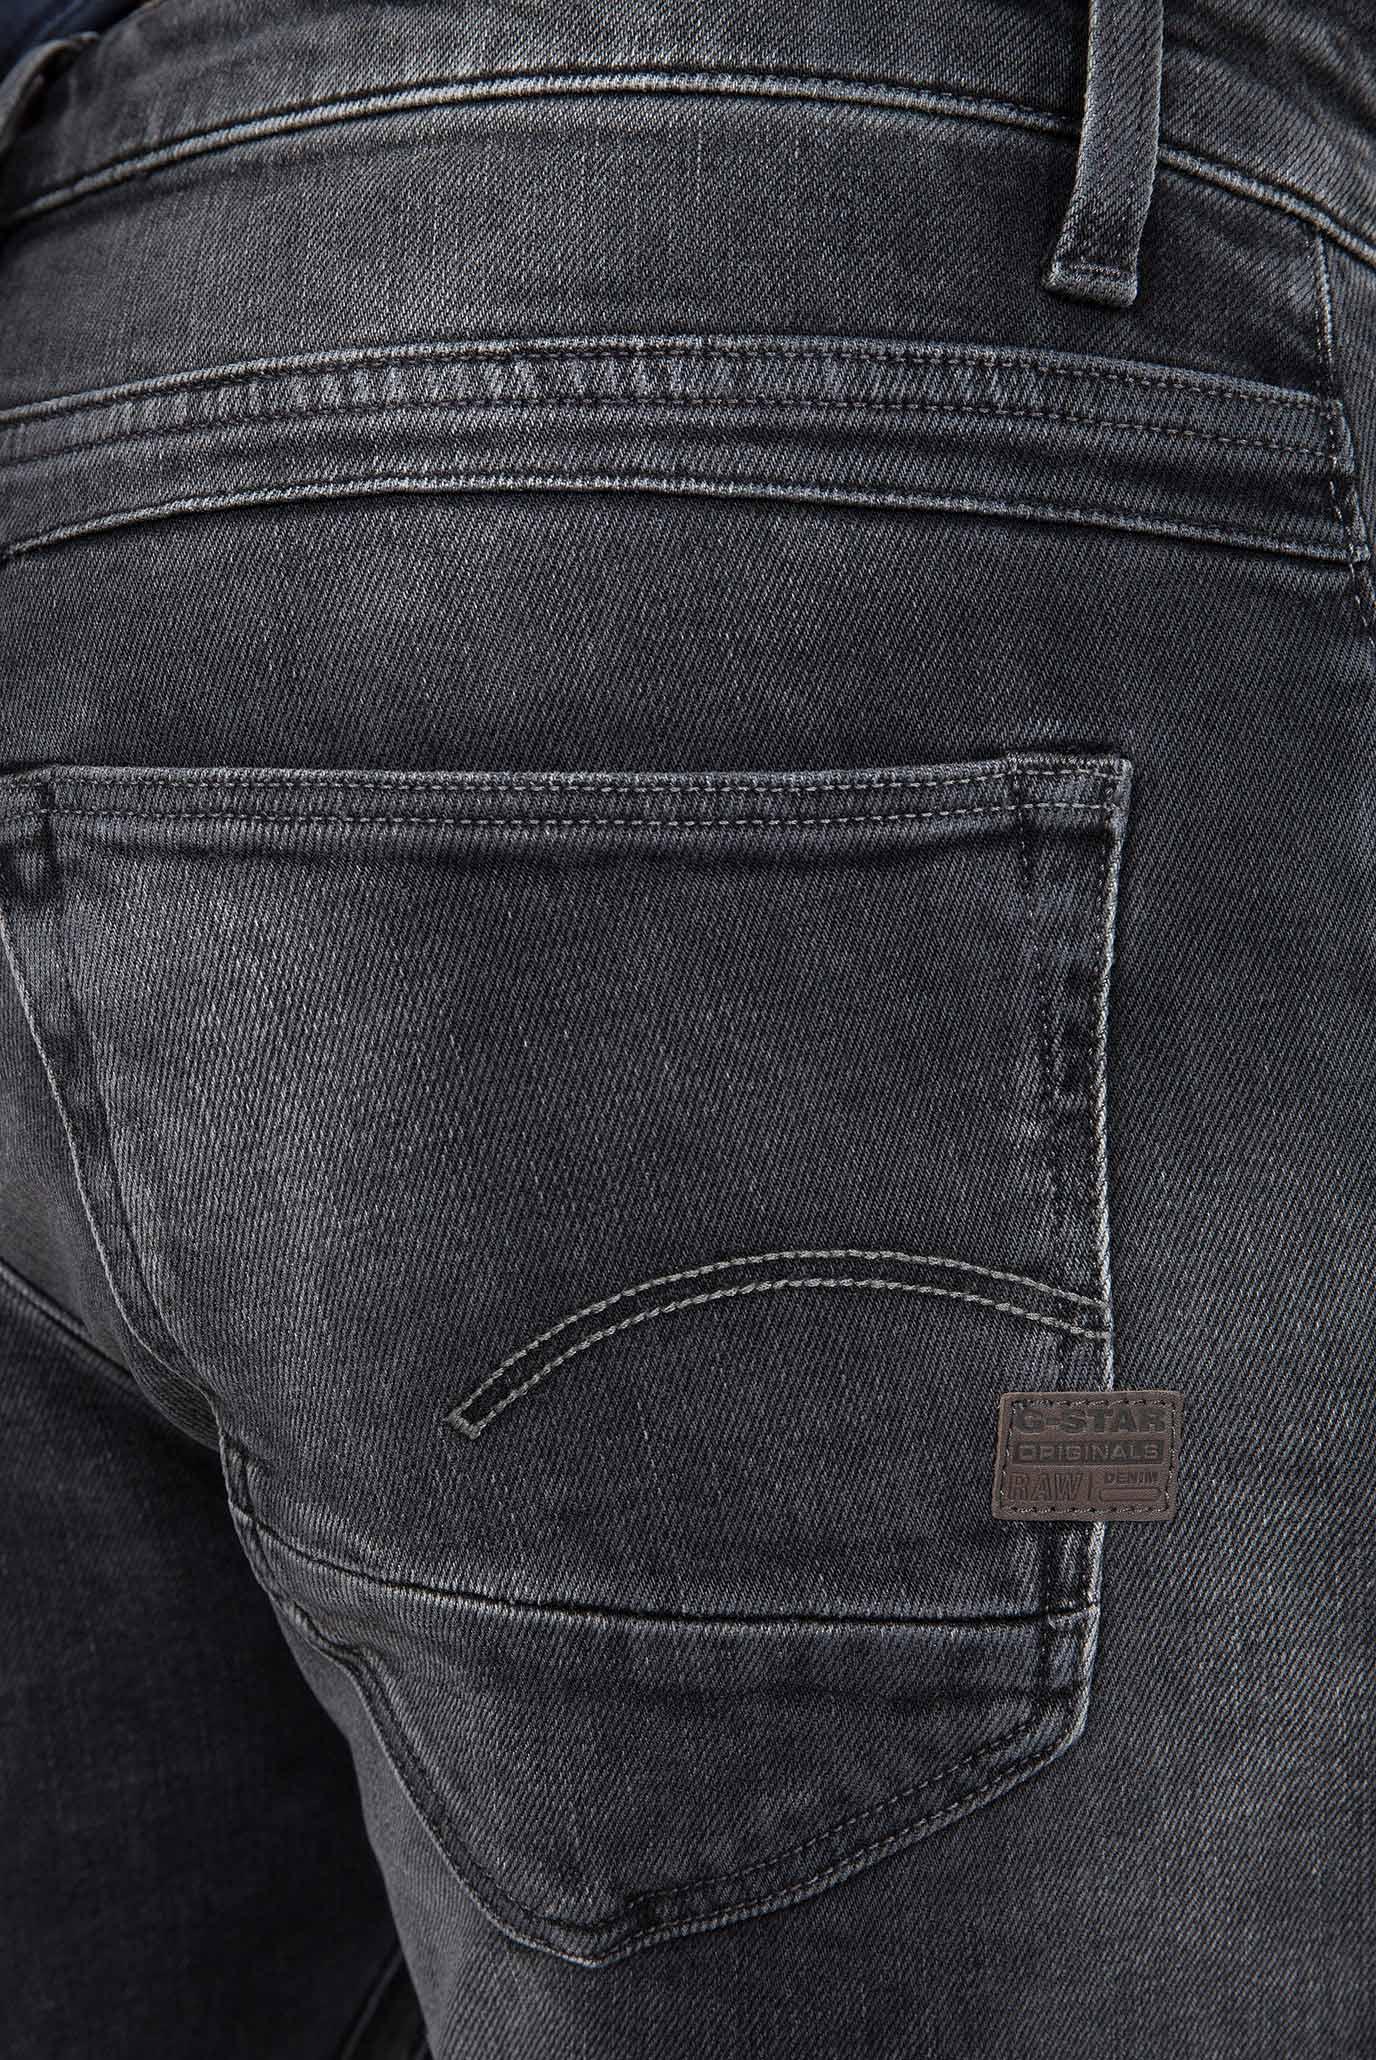 Мужские темно-серые джинсы D-Staq 5-pkt Slim G-Star RAW